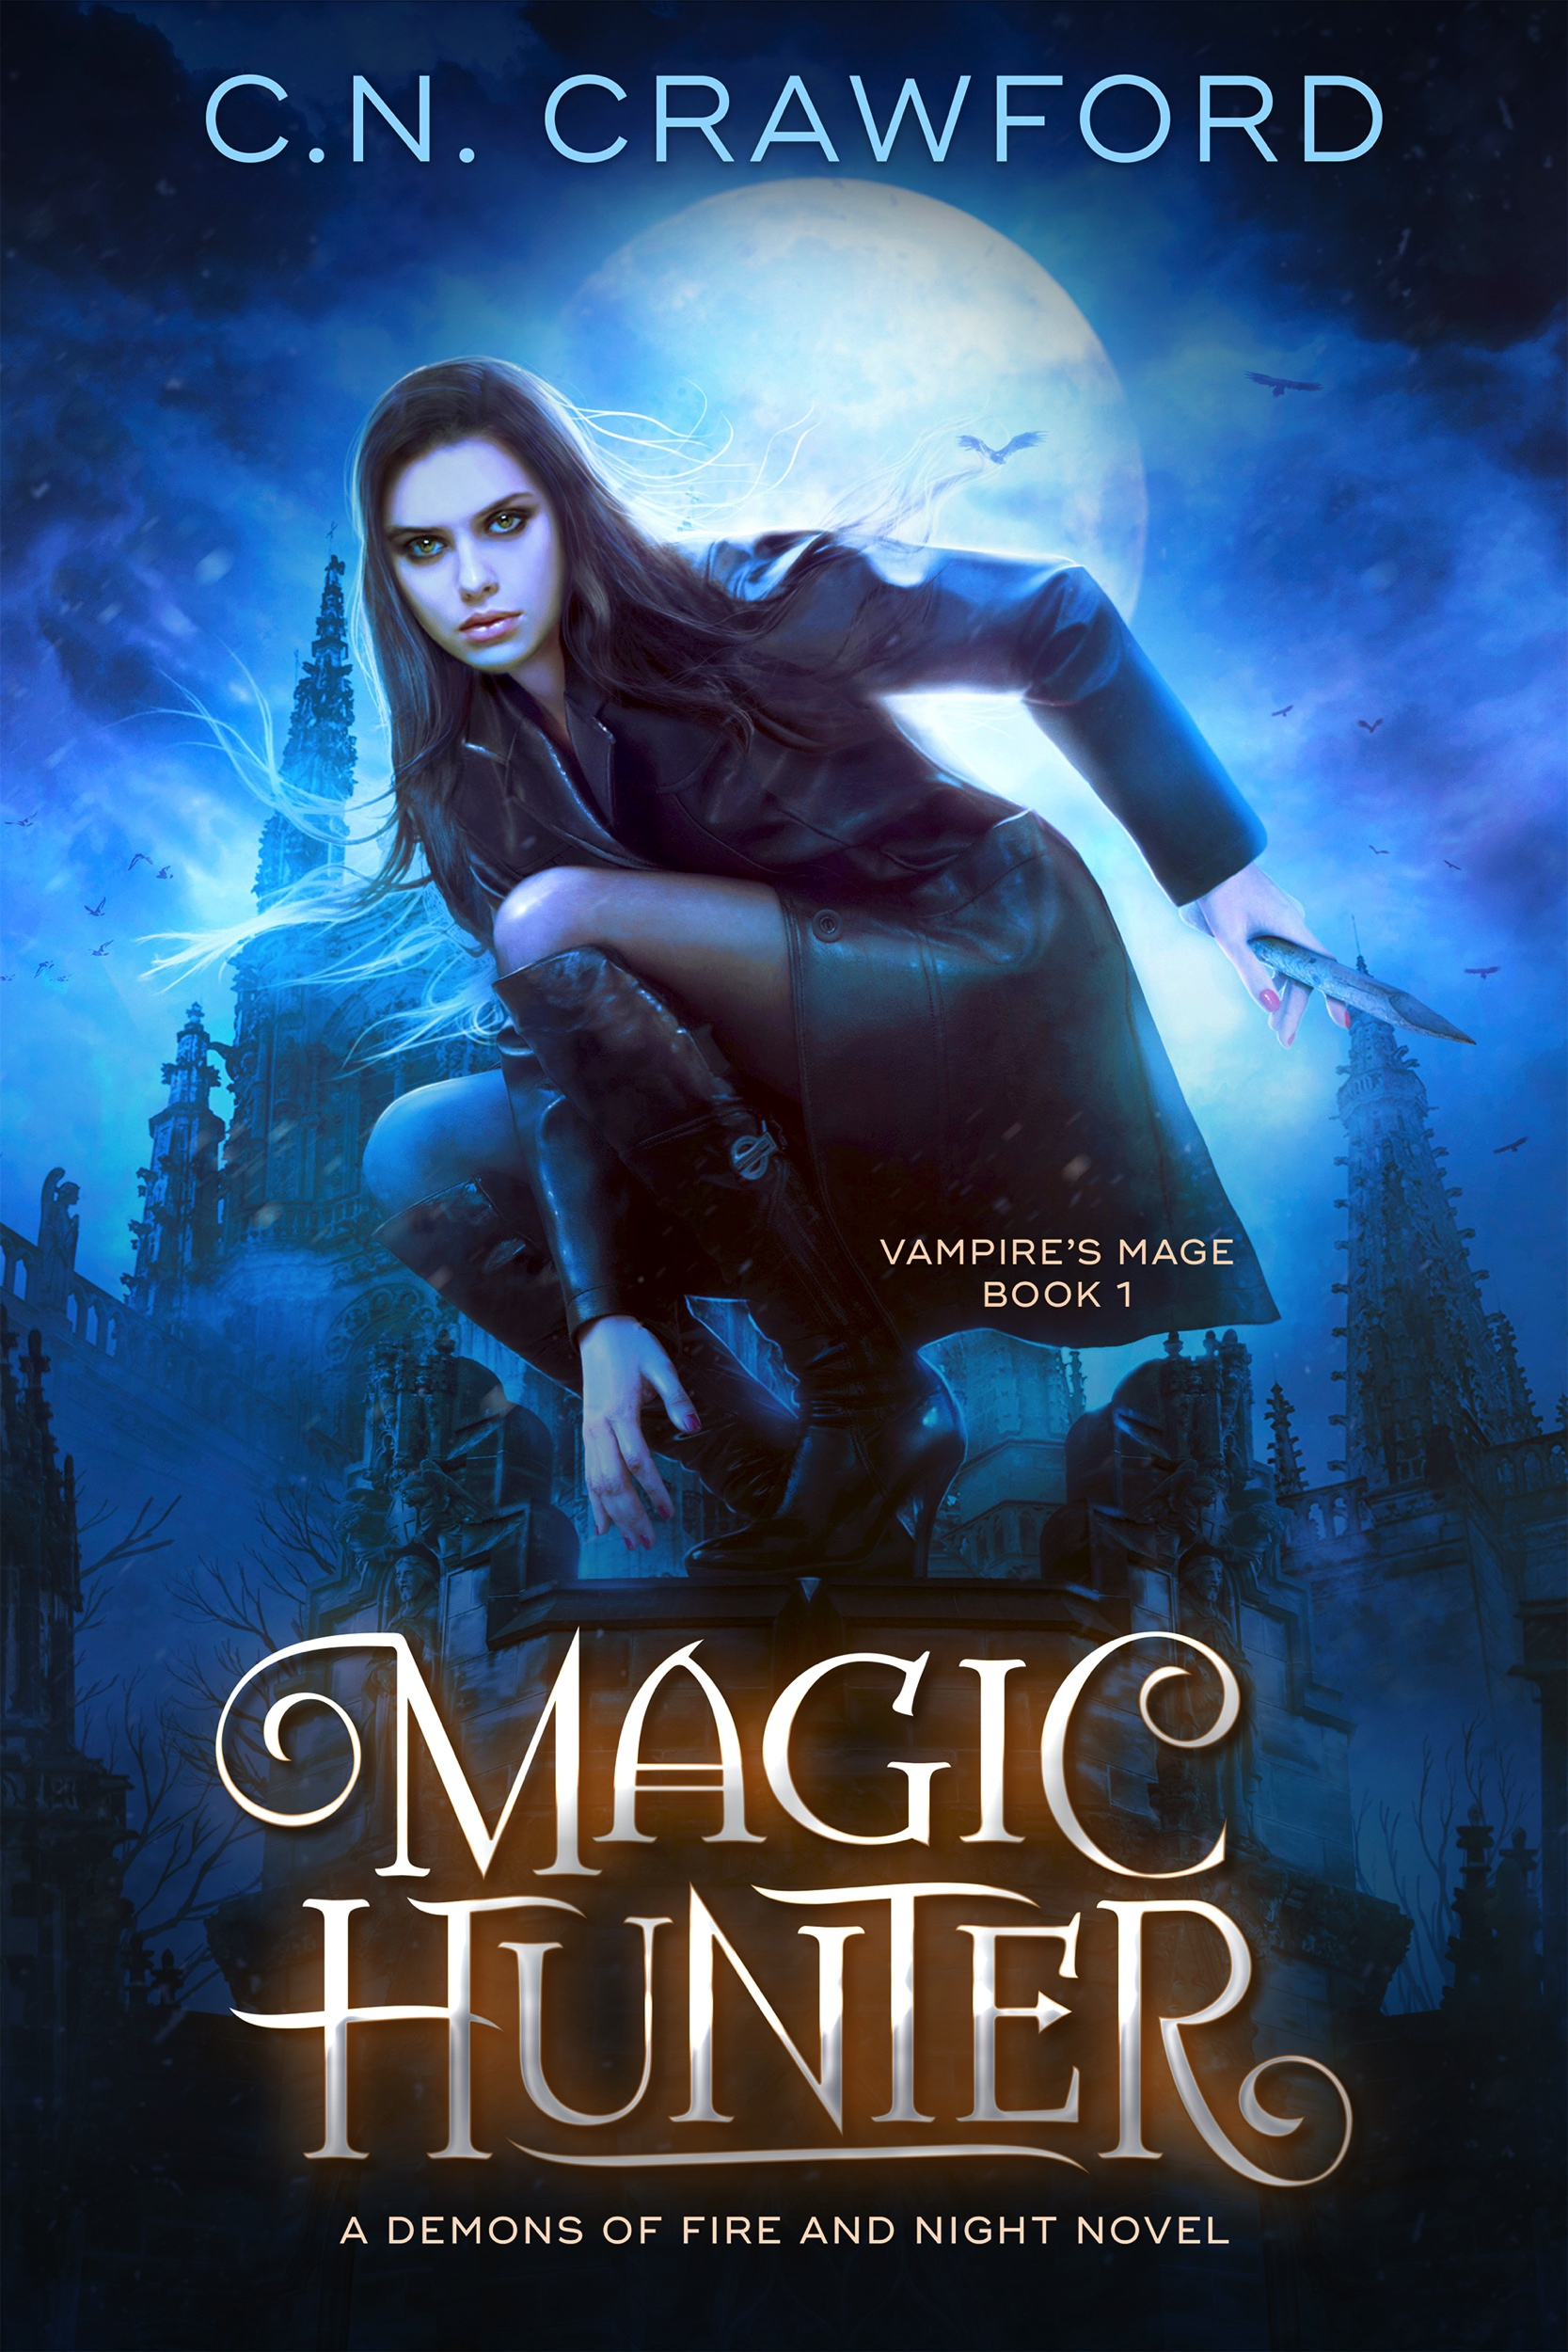 Book 1: Magic Hunter